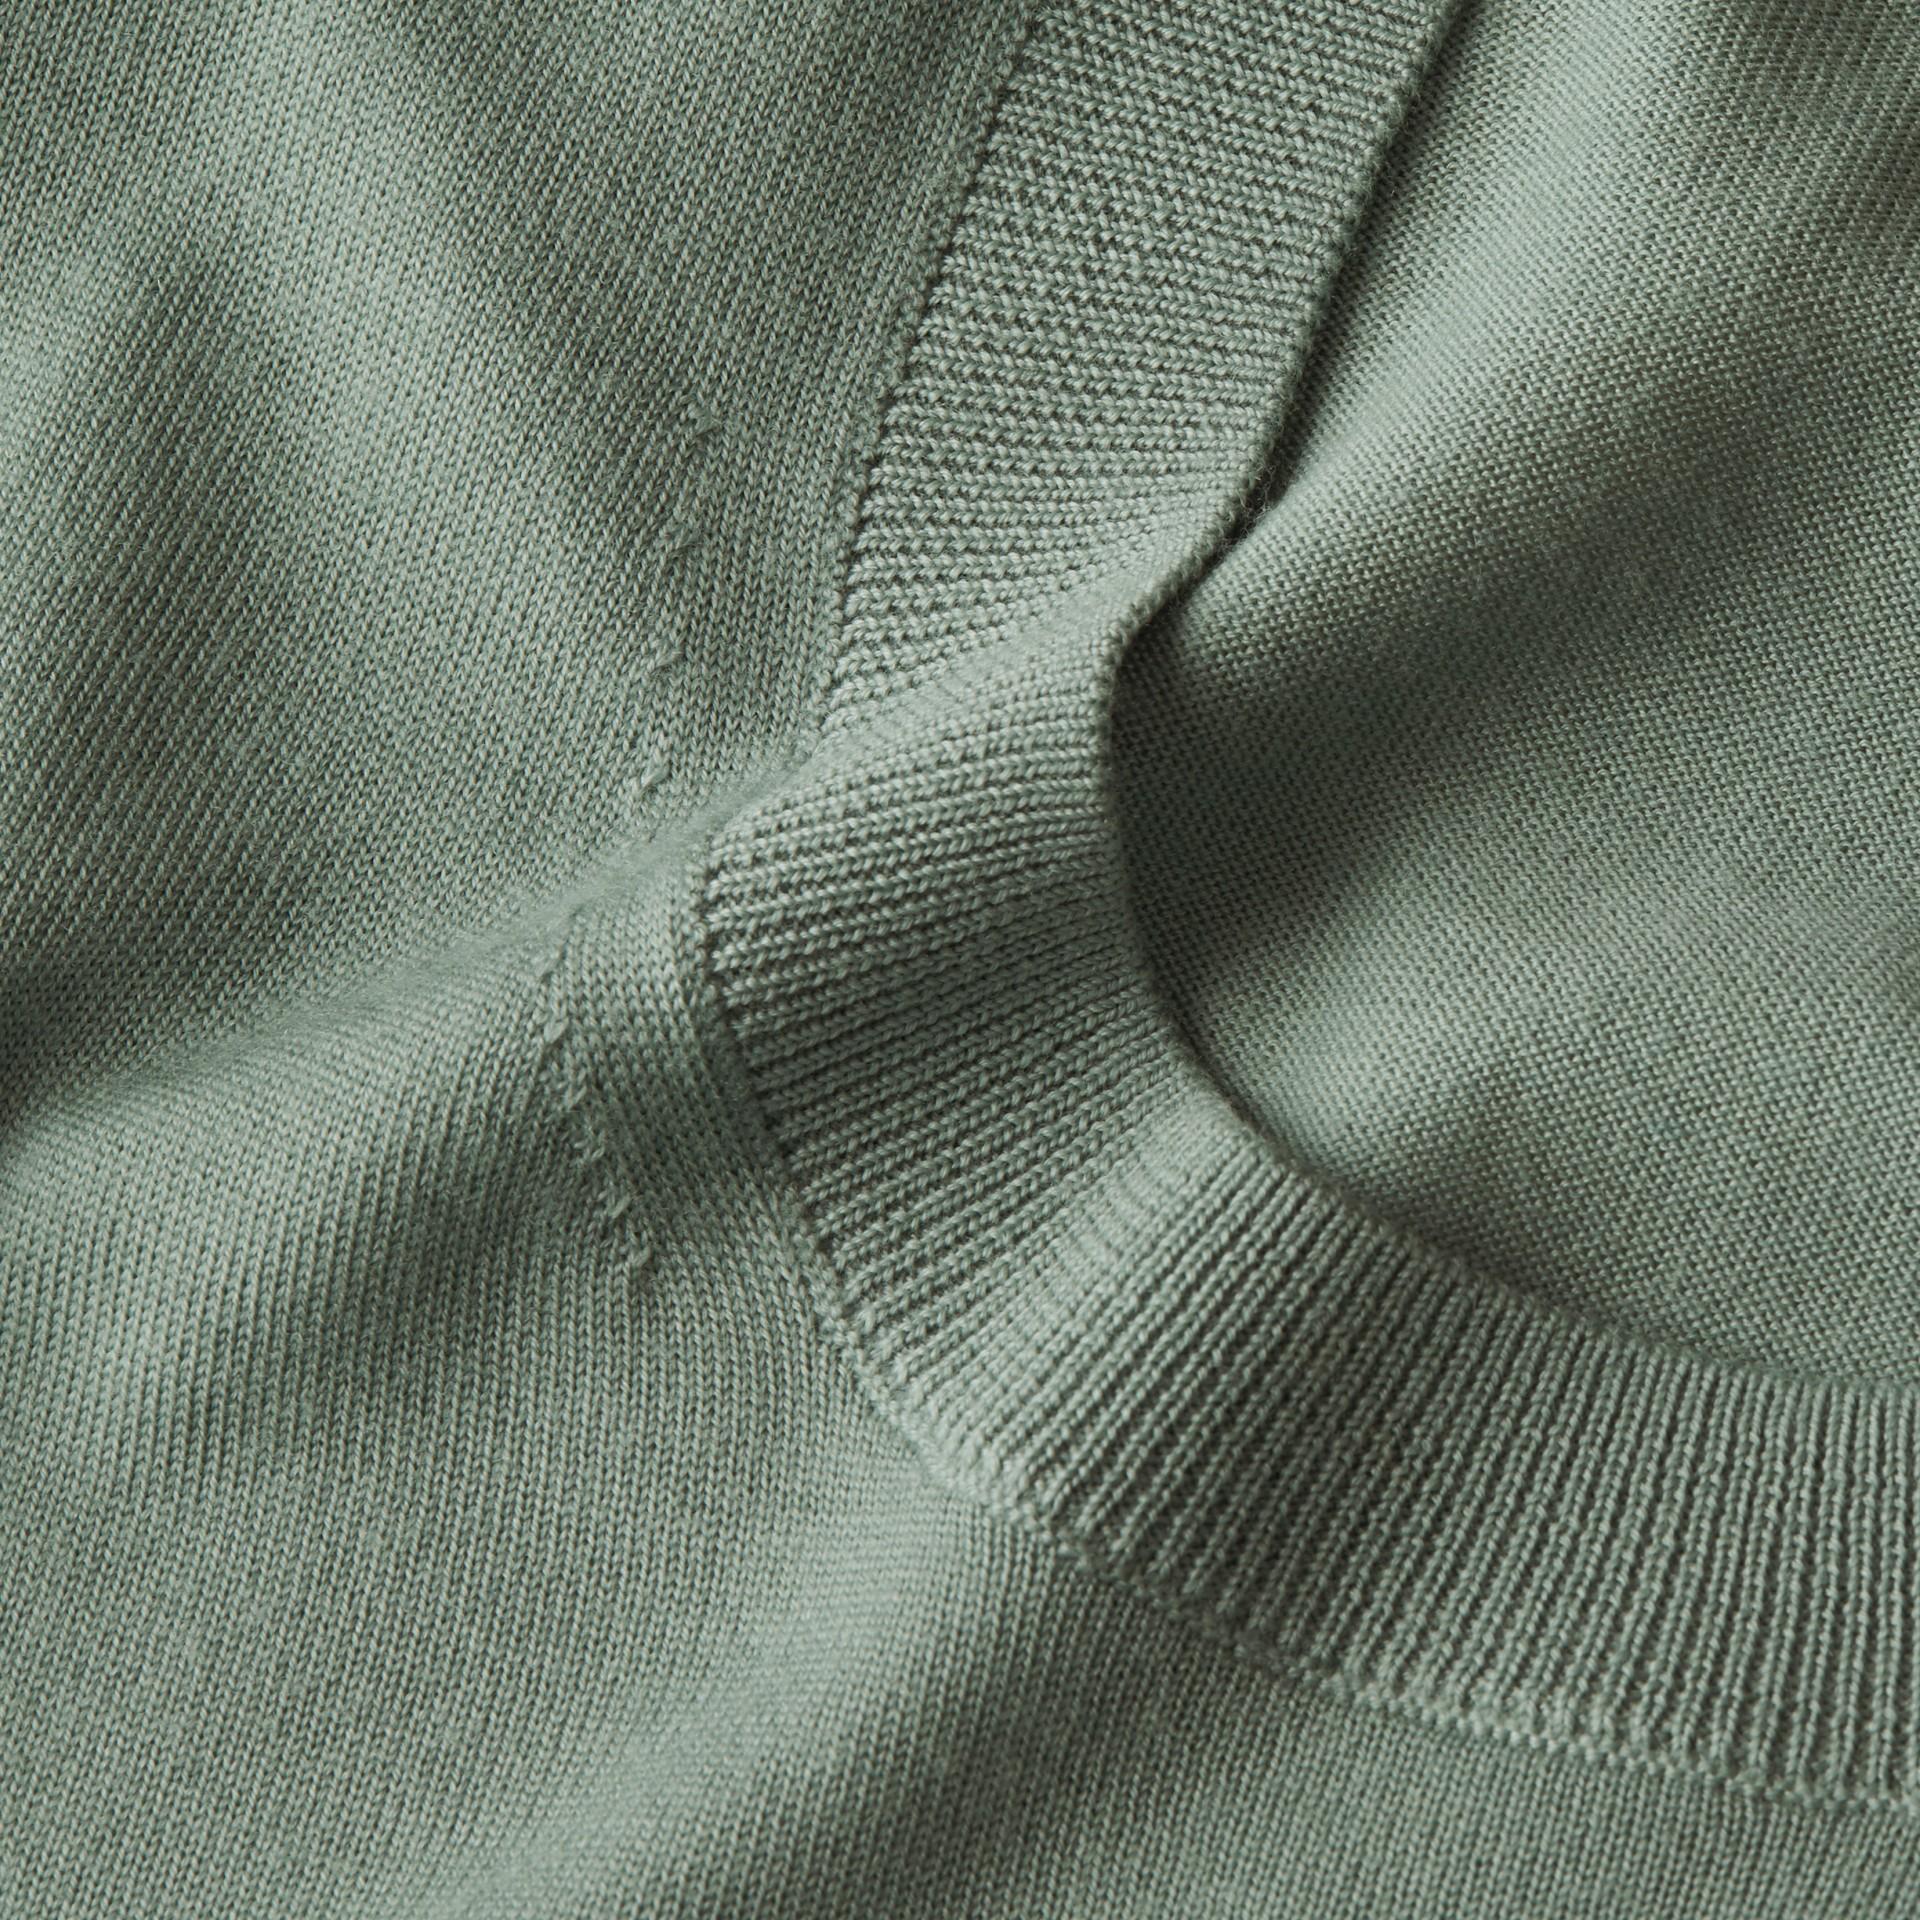 Vert eucalyptus Pull ras du cou en laine mérinos Vert Eucalyptus - photo de la galerie 2